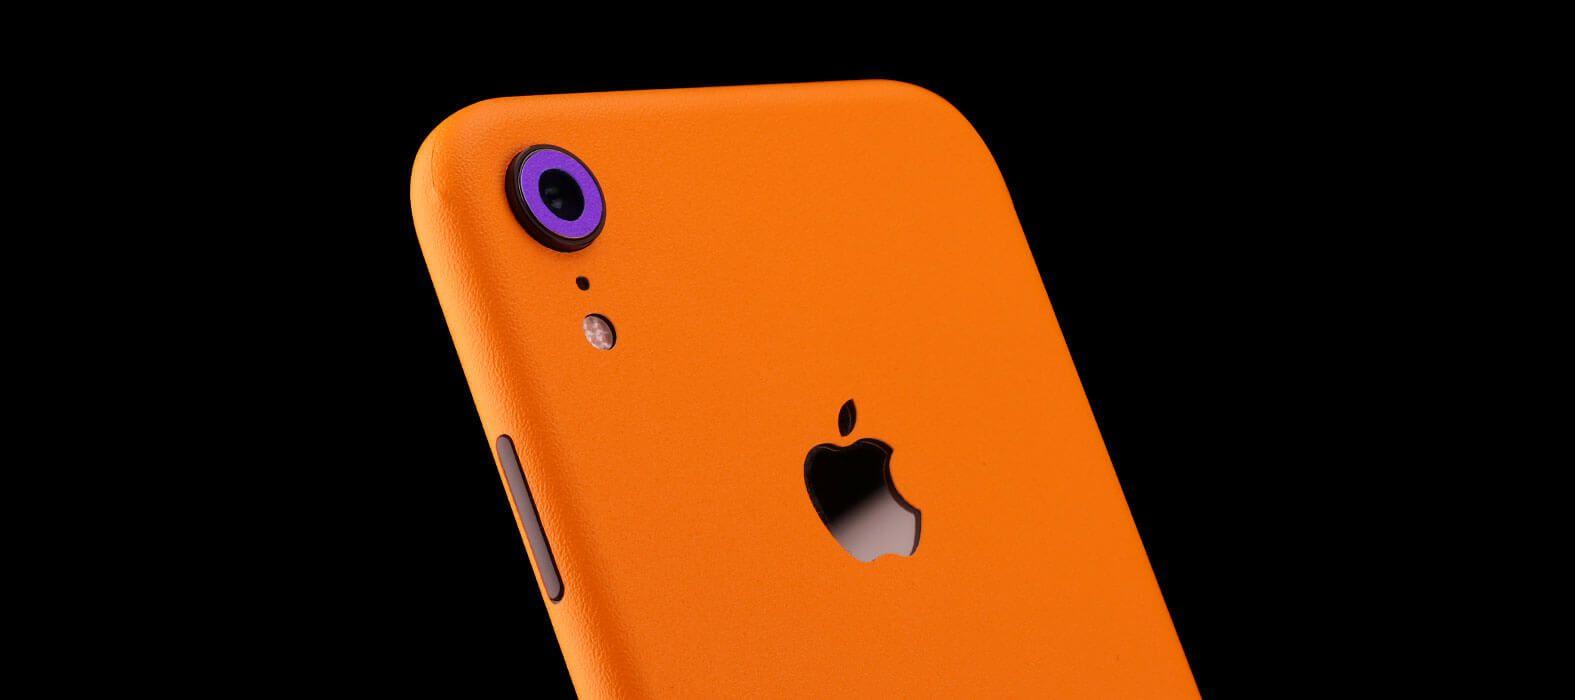 iphone-xr-sandstone-orange_skins